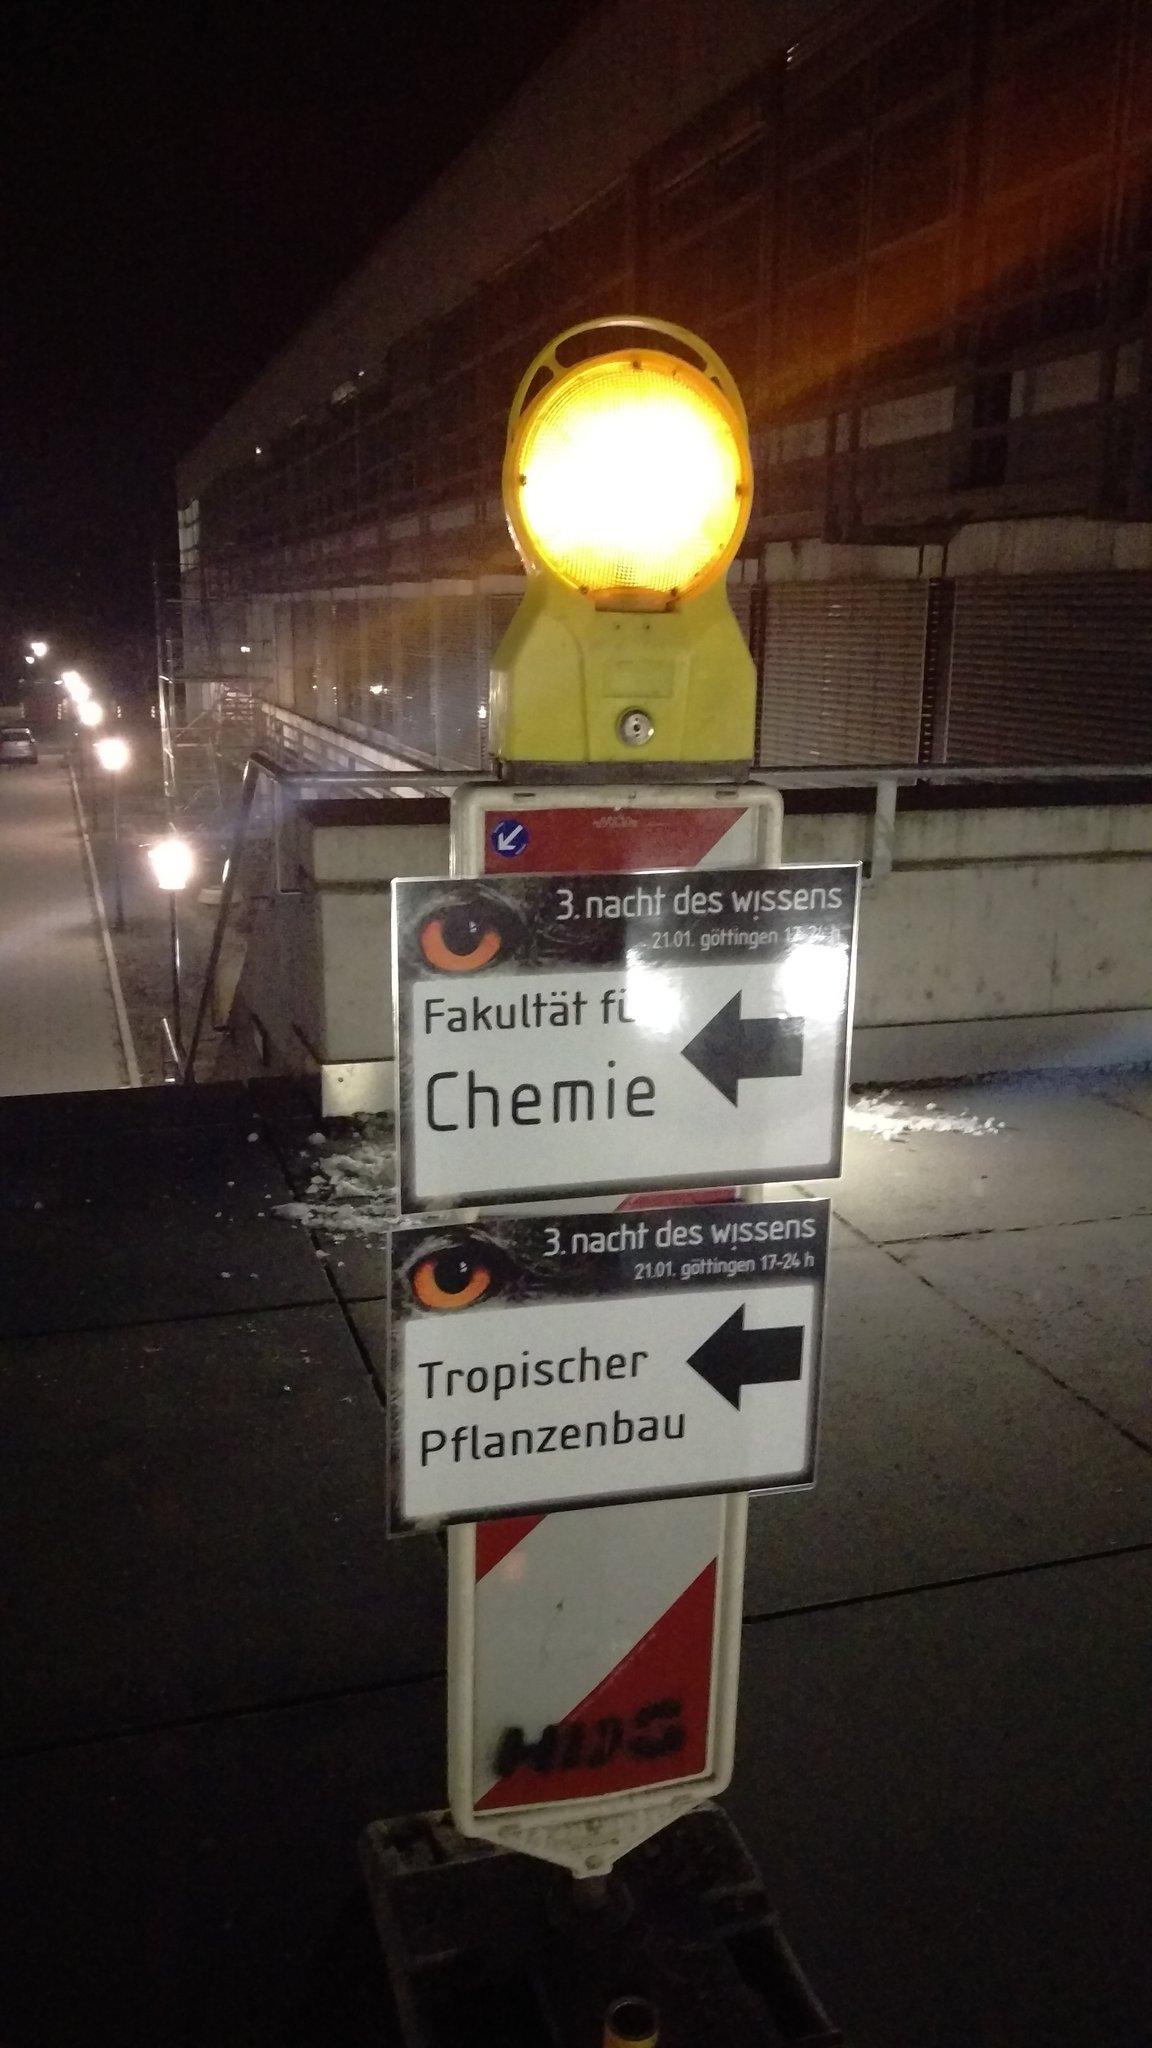 Folgt dem (orangen) Licht des Wissens morgen Nacht. #ndwgoe #goettingen #Wegeführung #unigoe https://t.co/YfDCo7SNH7